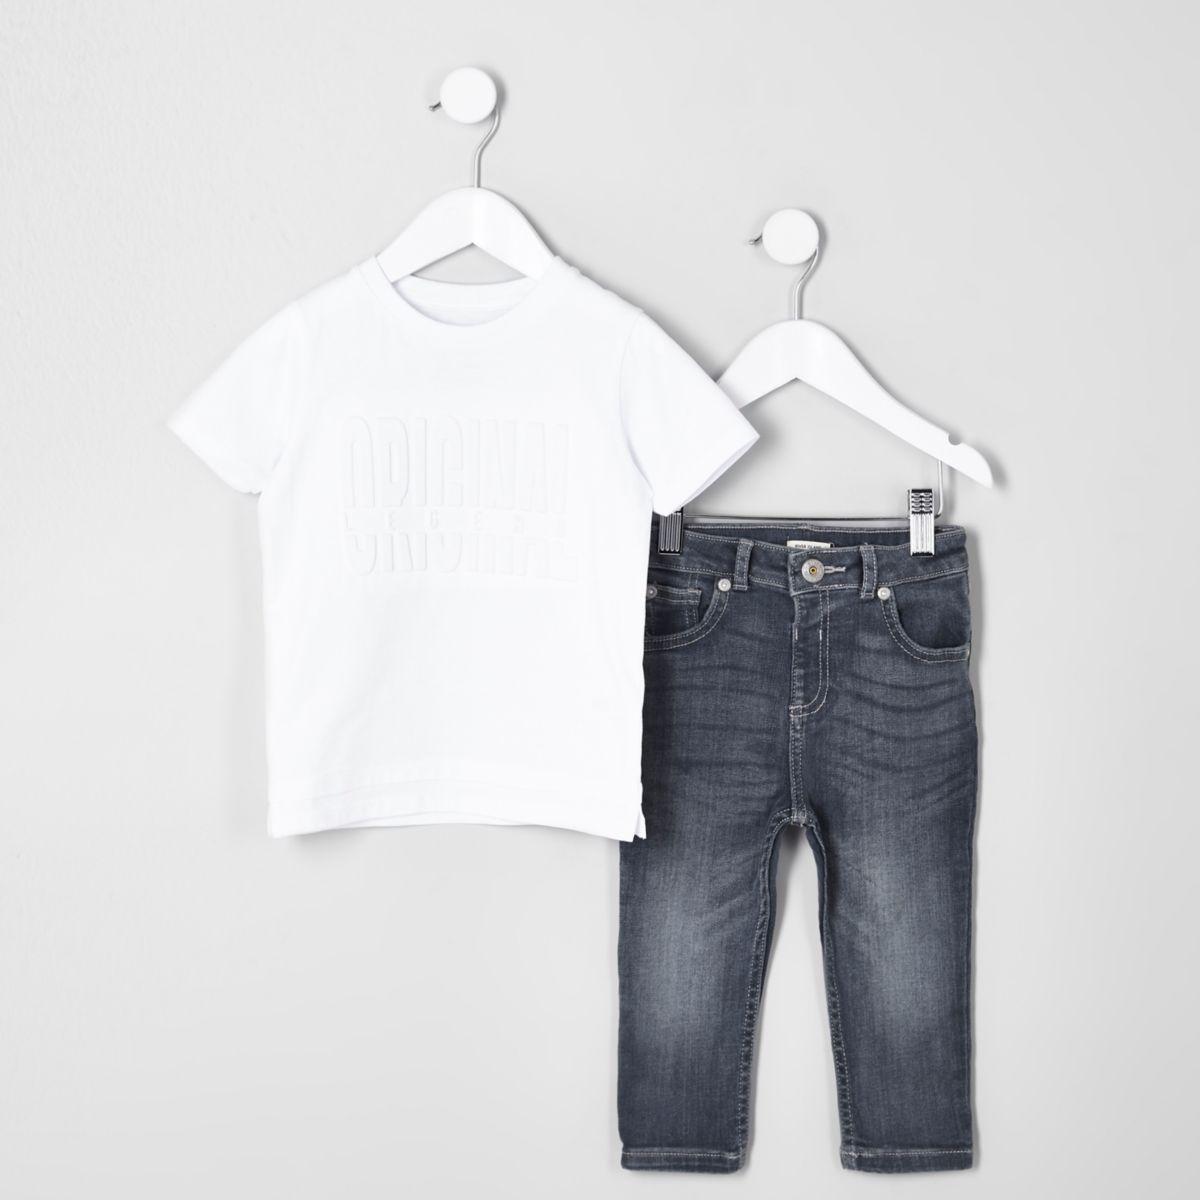 Mini boys 'original legend' T-shirt outfit